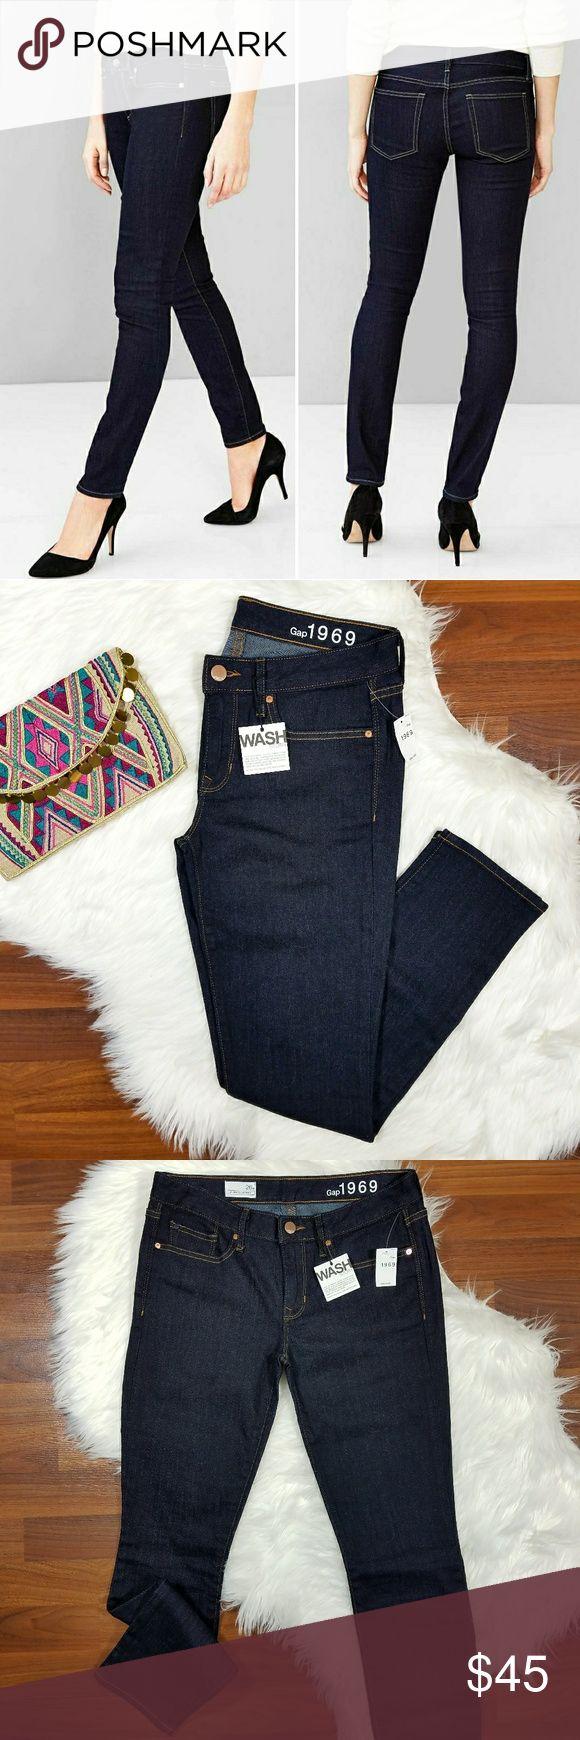 "Gap // Always Skinny Jeans in Rinse Brand new with all original tags!  GAP Always Skinny Jeans Size 26 Short Wash: Rinse  Premium stretch denim Dark blue with contrast topstitching Button closure, zip fly Five-pocket styling  Inseam: 27.5"" Rise: 7.75"" Waist: 14.5"" flat across  Hip: 17.75"" flat across  98% Cotton, 2% Spandex GAP Jeans Skinny"